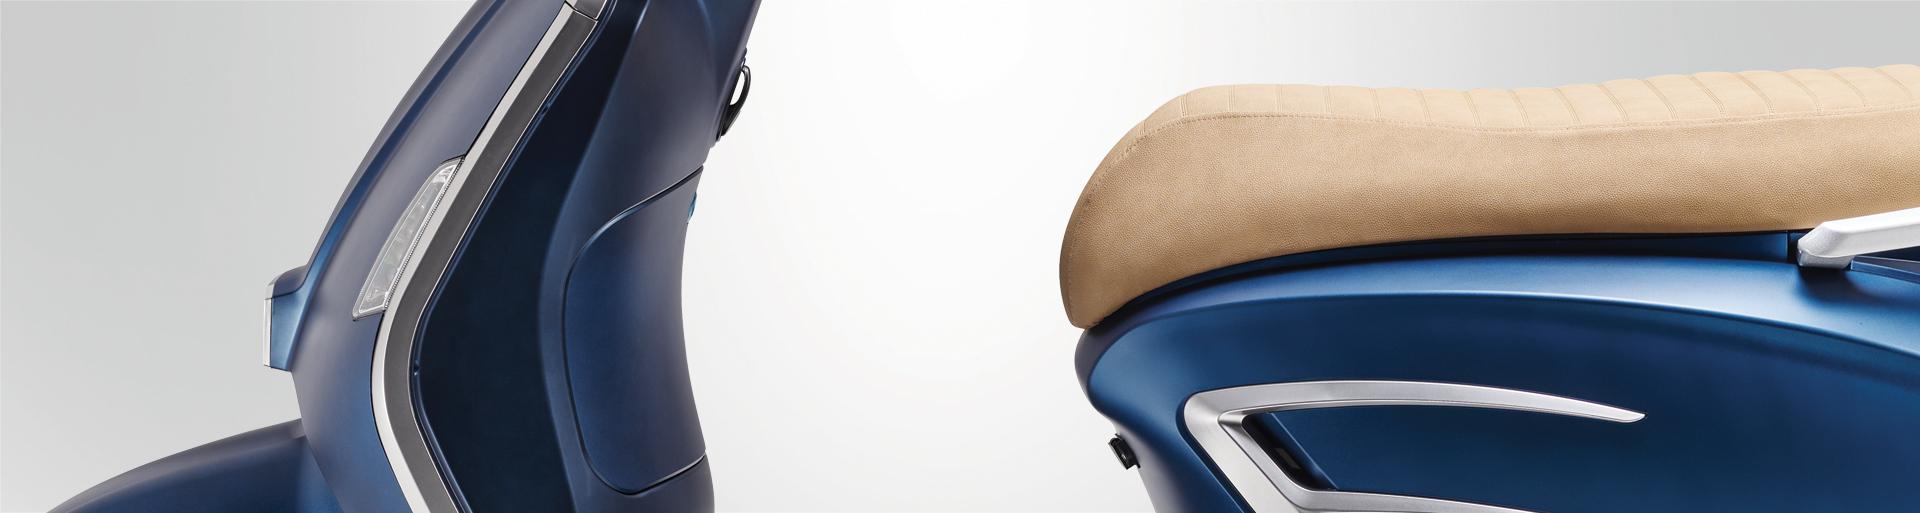 tilgreen-scooters-electriques-50-cm3